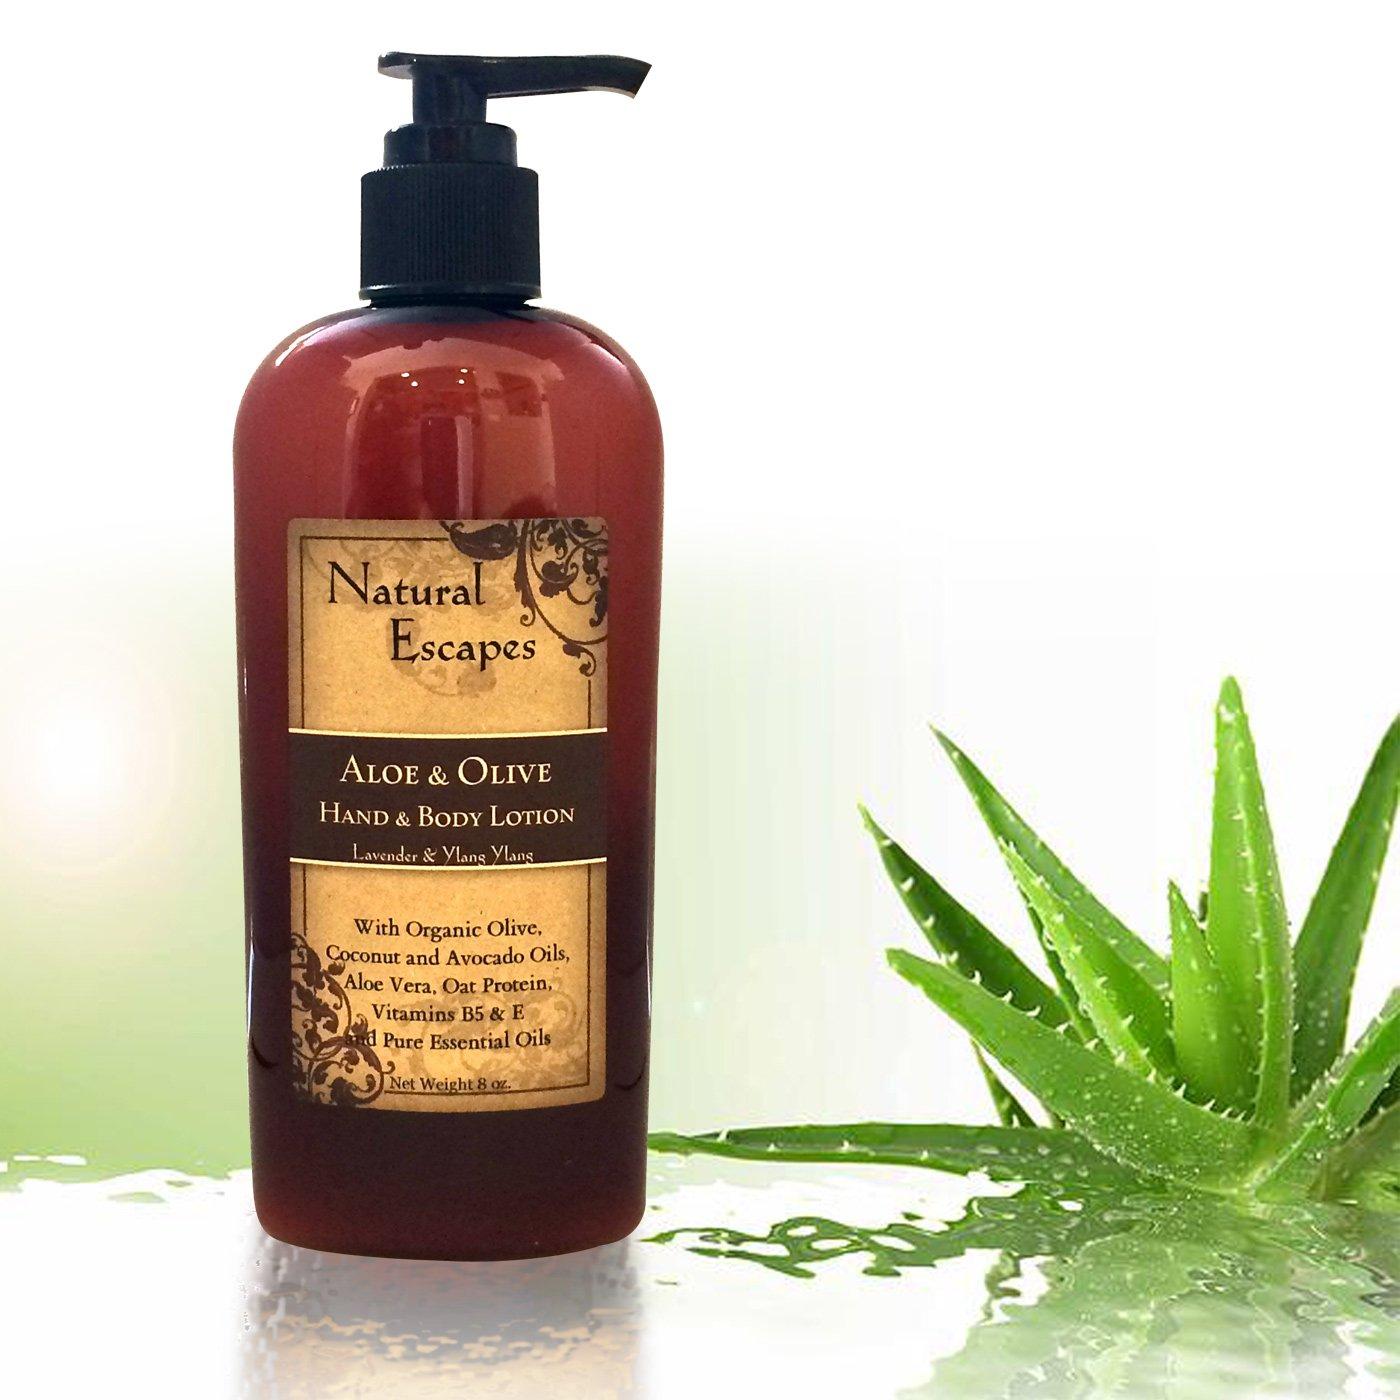 rganic Lemongrass Lotion w/Aloe Vera, Olive Oil, Coconut Oil & Avocado Oil   Organic Body Cream & Hand Lotion for Dry Skin, Itchy Skin, Eczema, Psoriasis & More